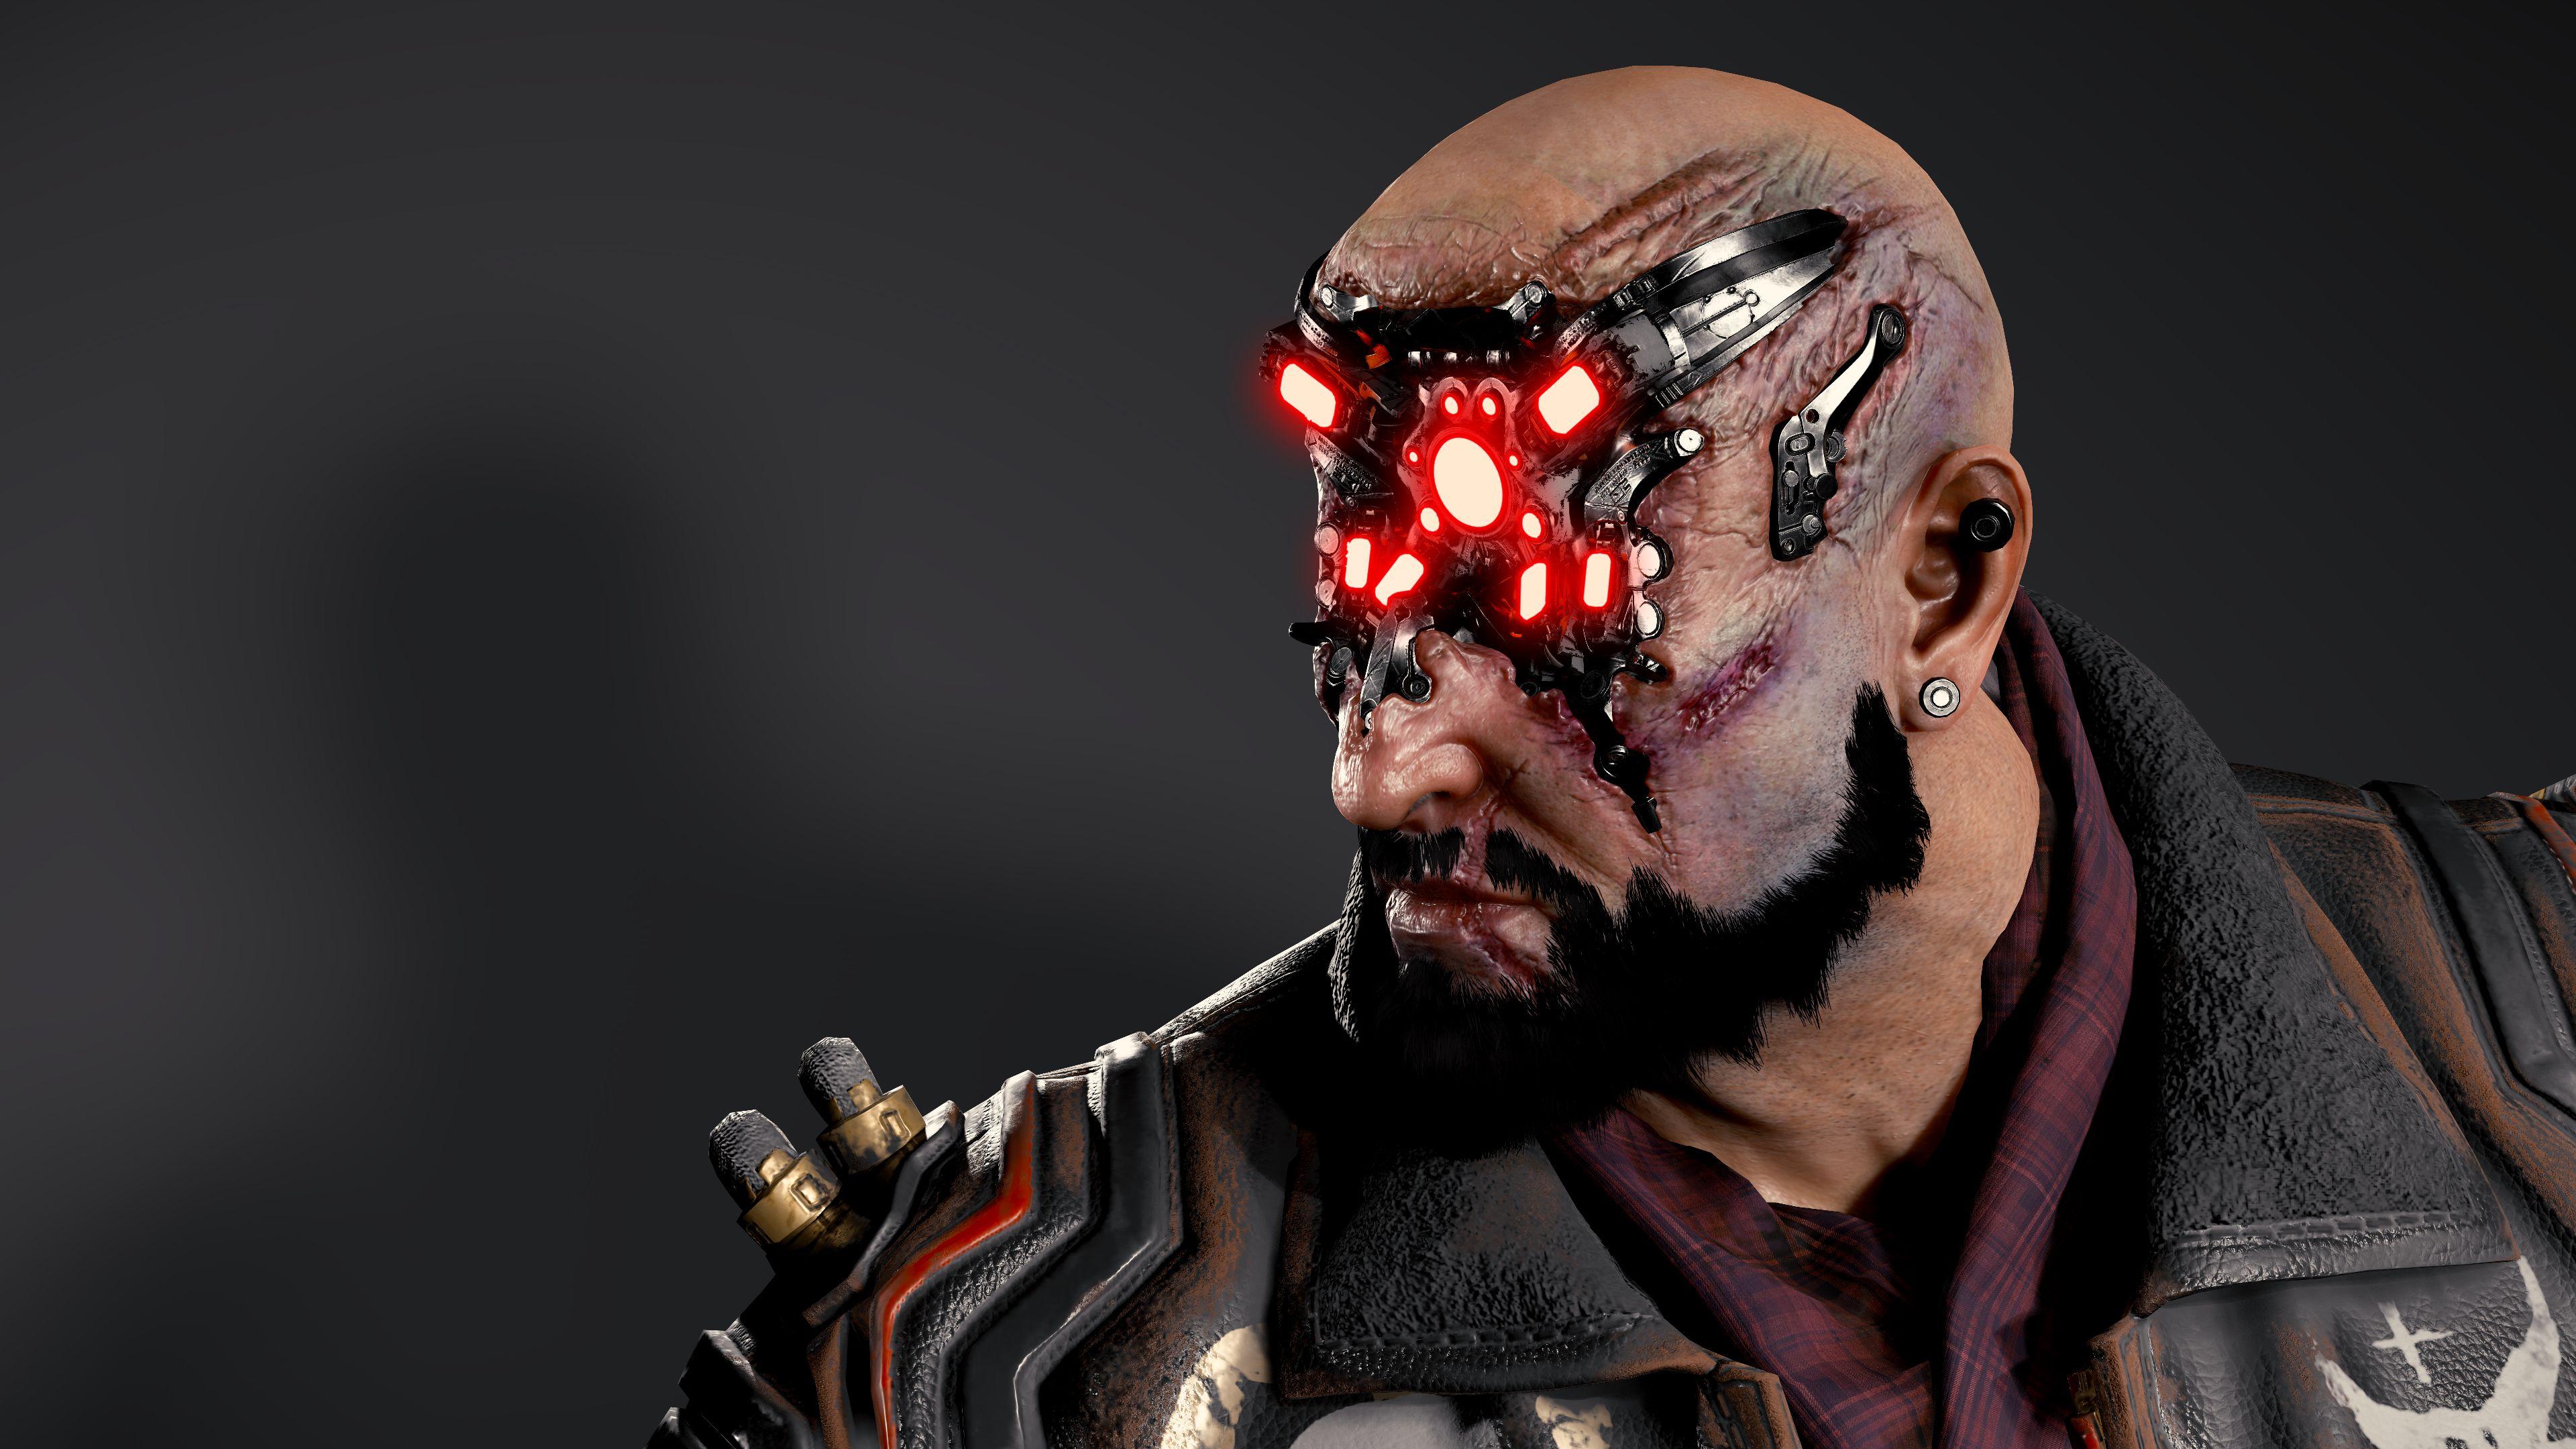 Ройс - Cyberpunk 2077